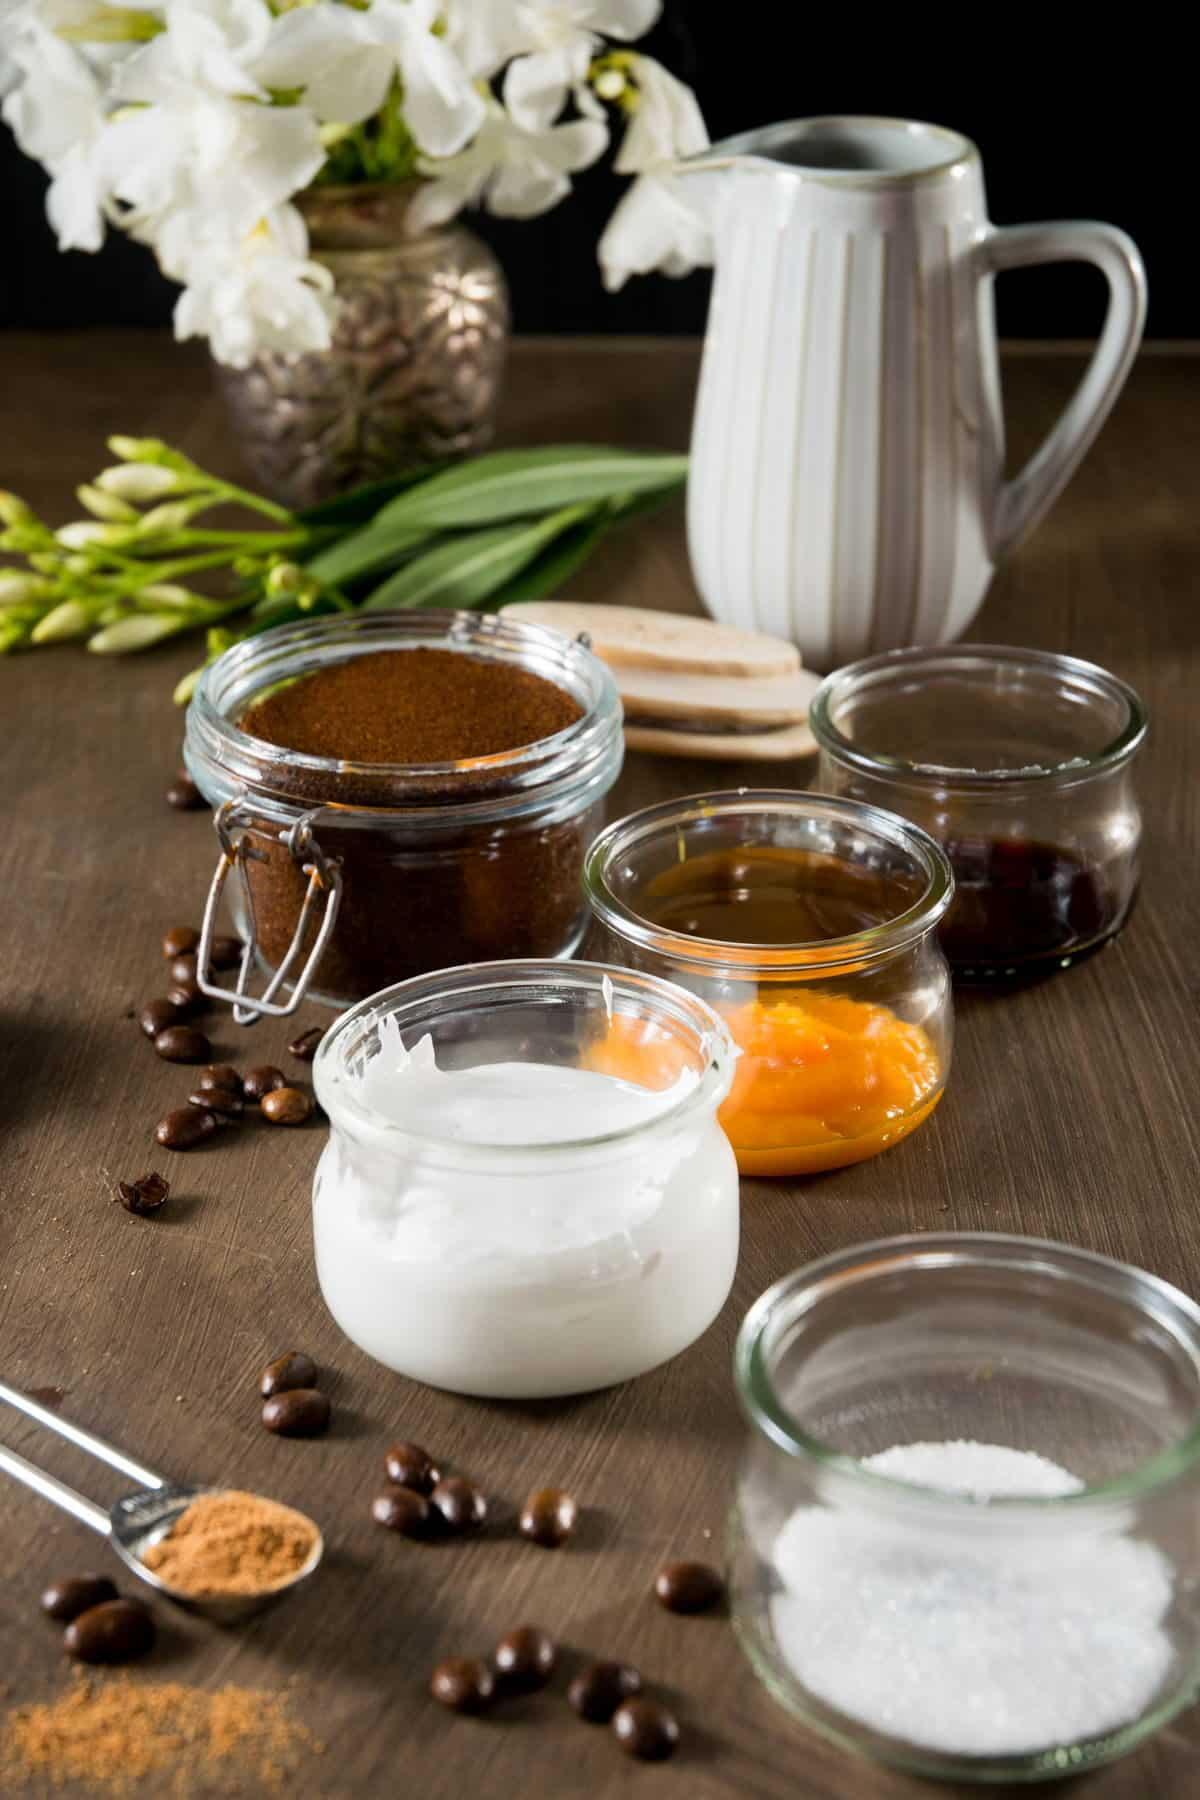 Marshmallow pumpkin latte ingredients on wood background.